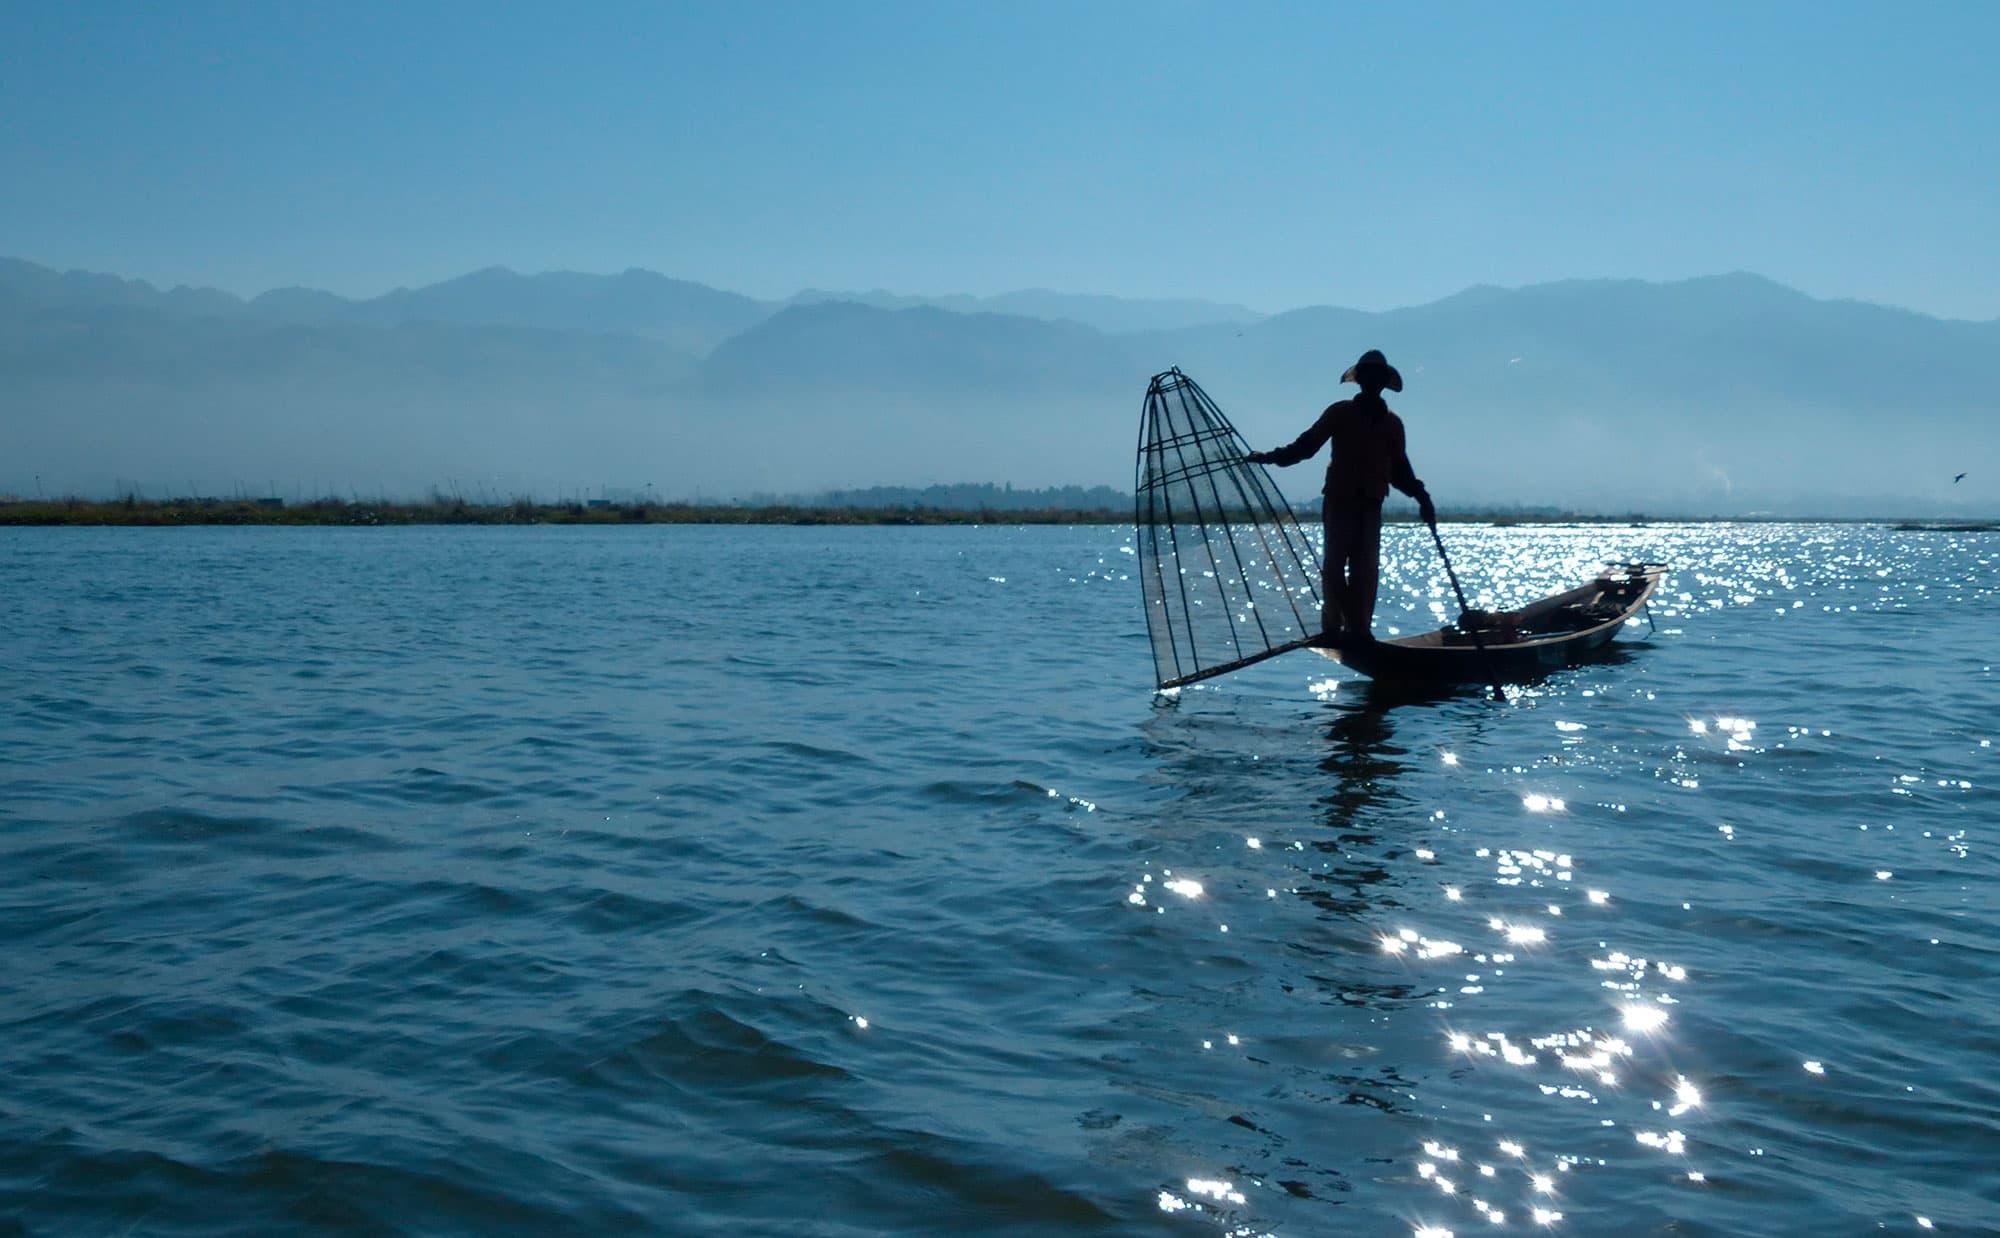 Myanmar espléndido, viaje de lujo - Myanmar- imagen #8